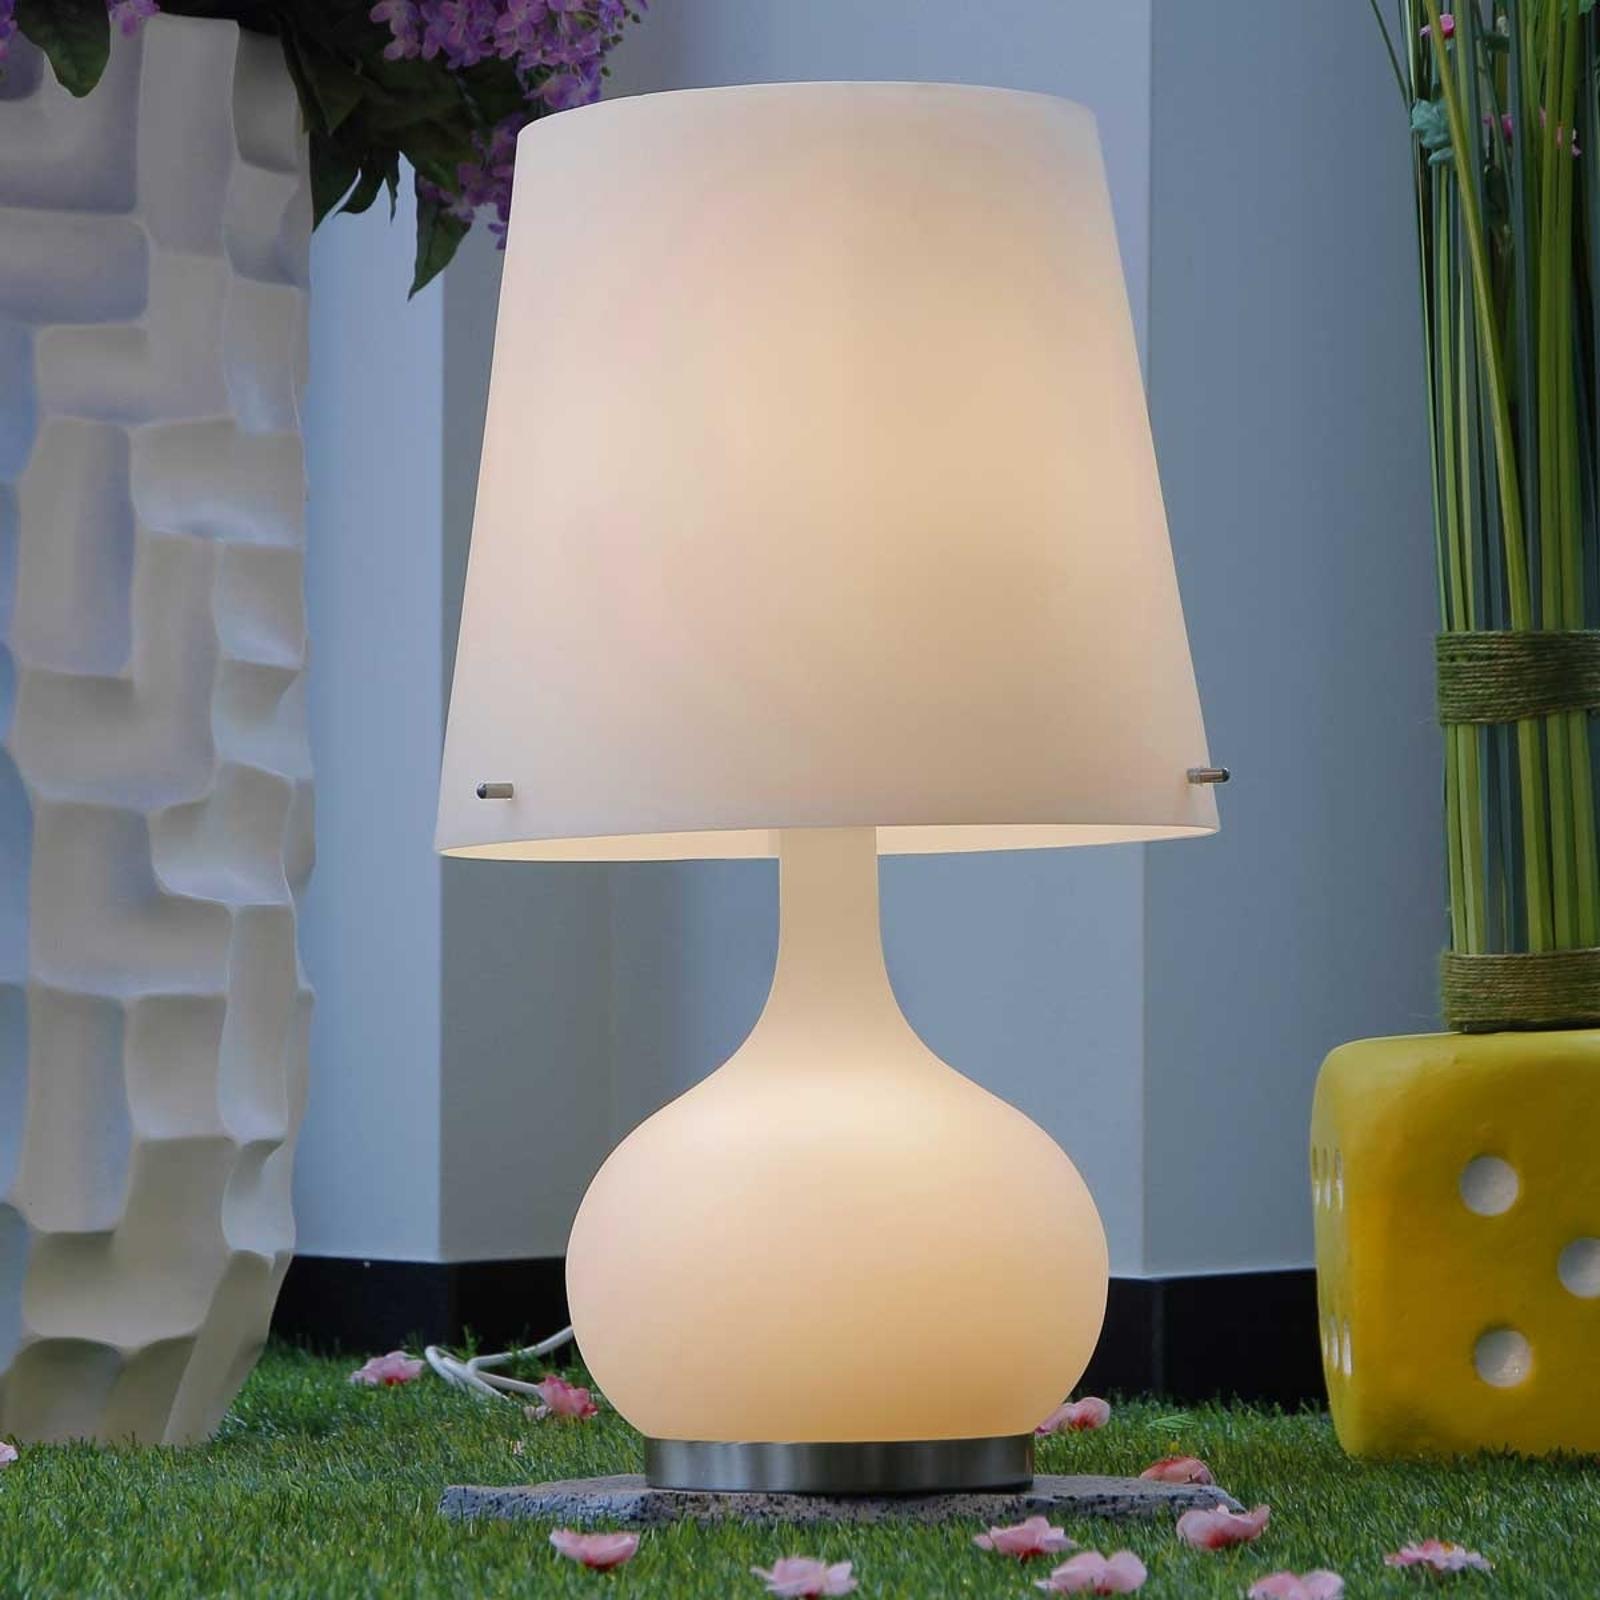 Table lamp Ade white 58 cm_3501131_1